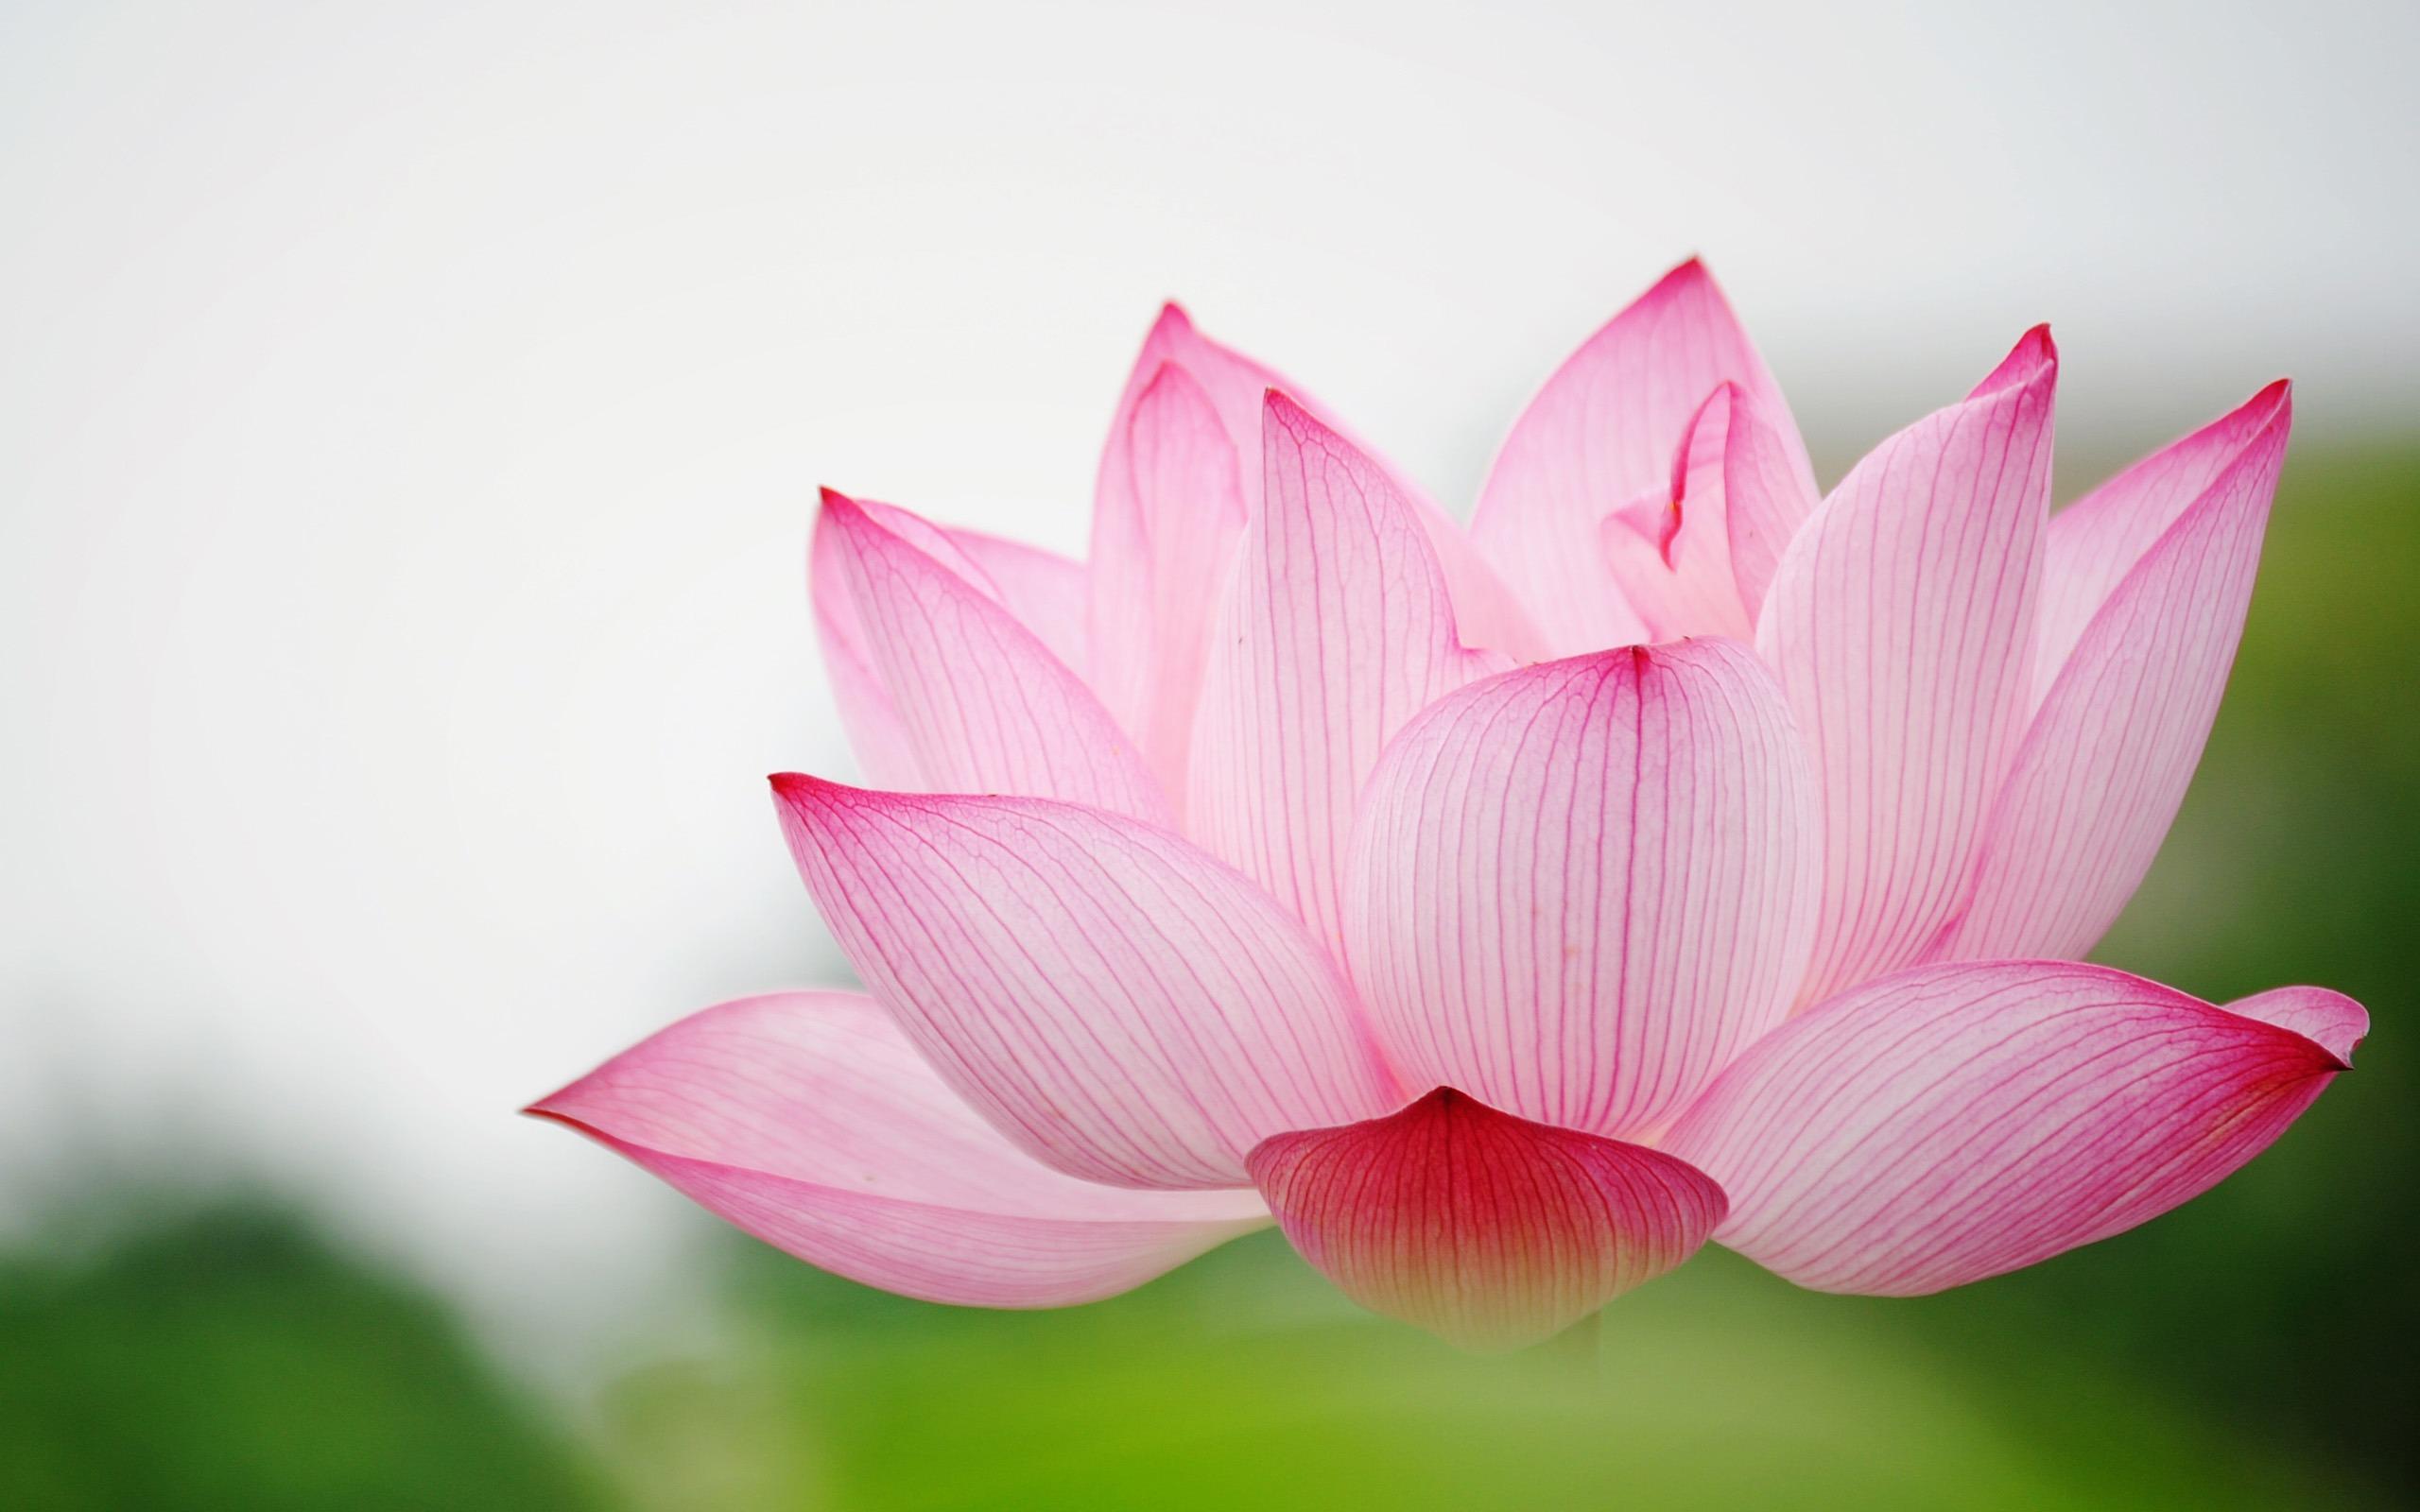 flower garden love pink lily lotus hd wallpaper wallpaper background ...